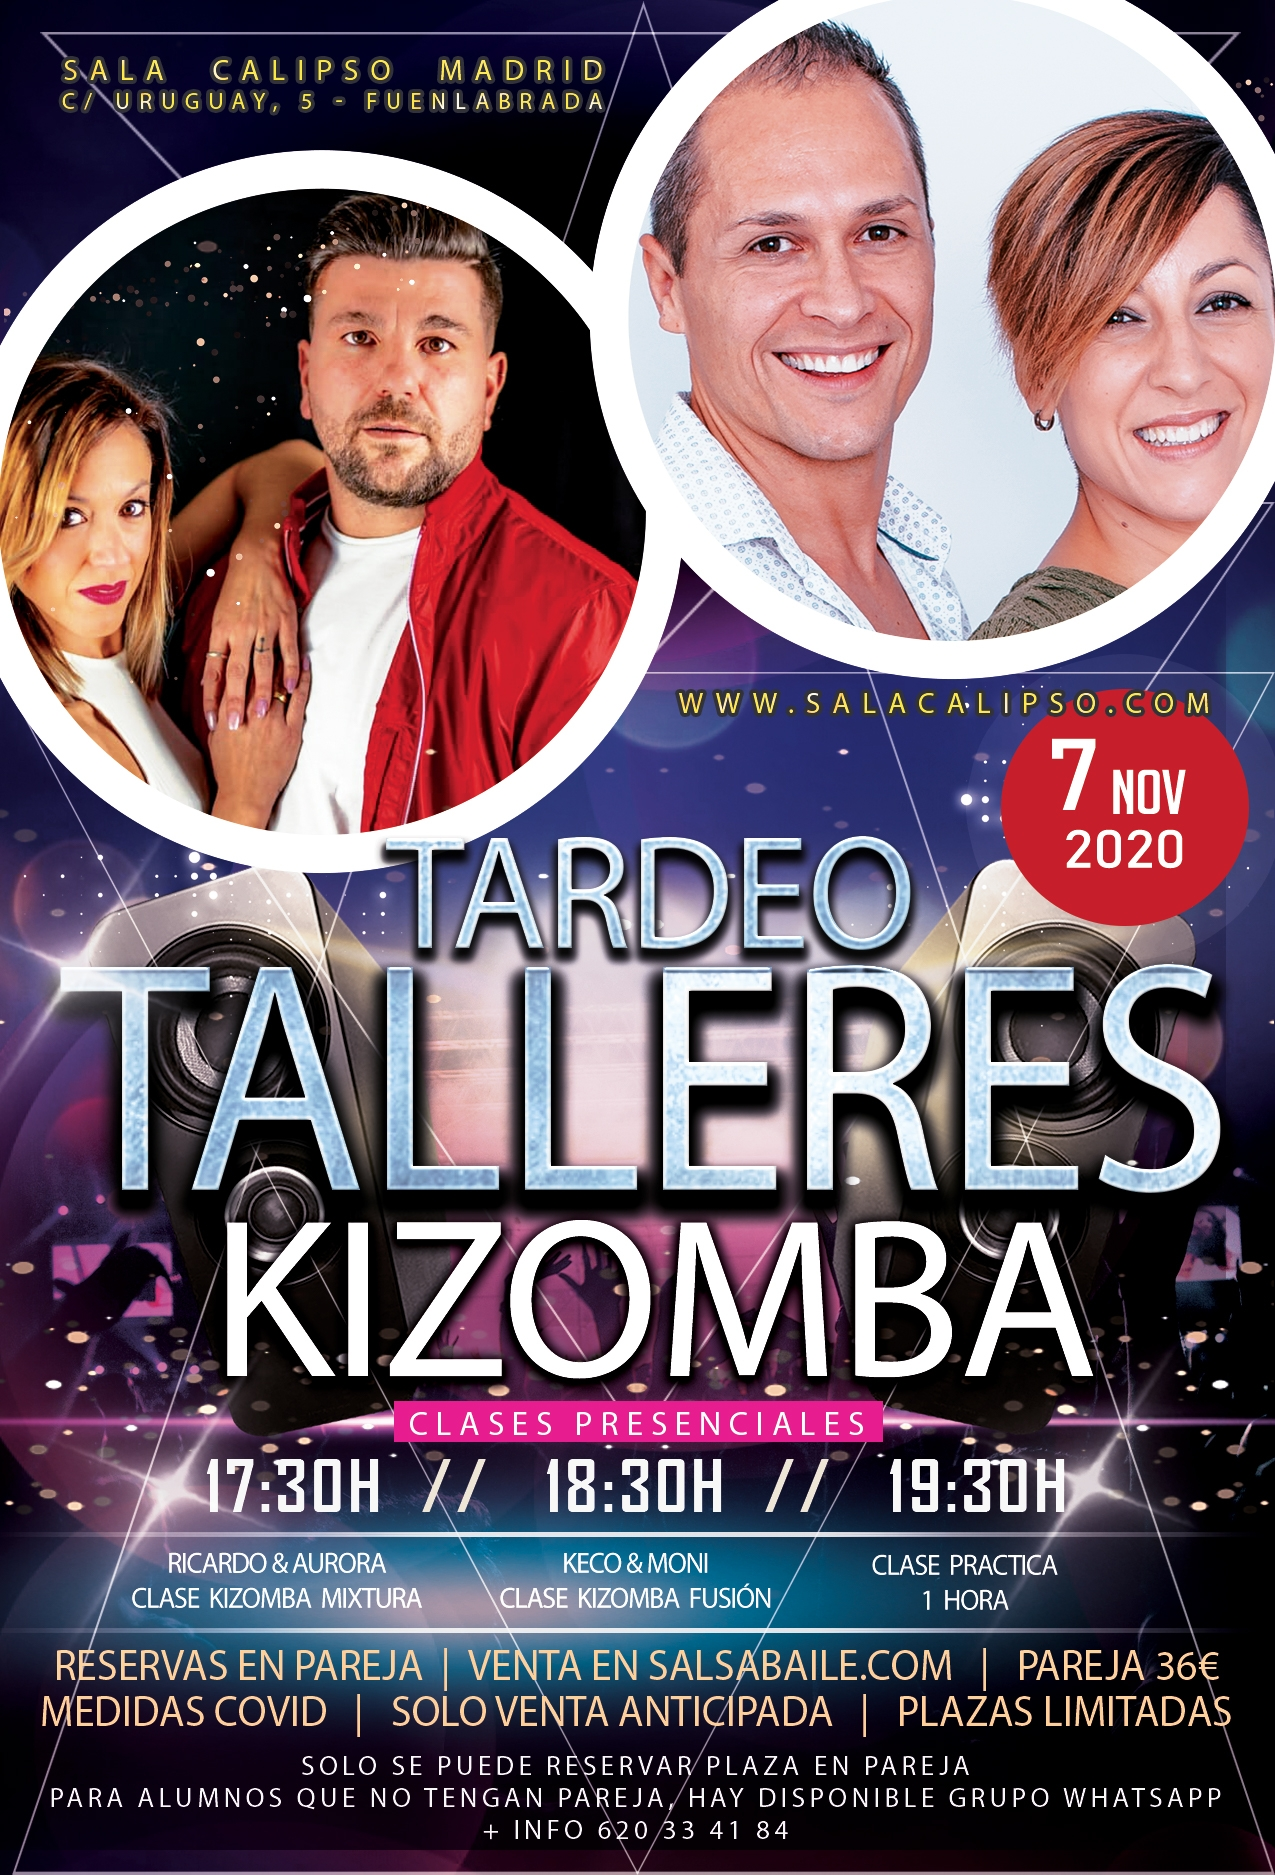 TARDEO KIZOMBERO